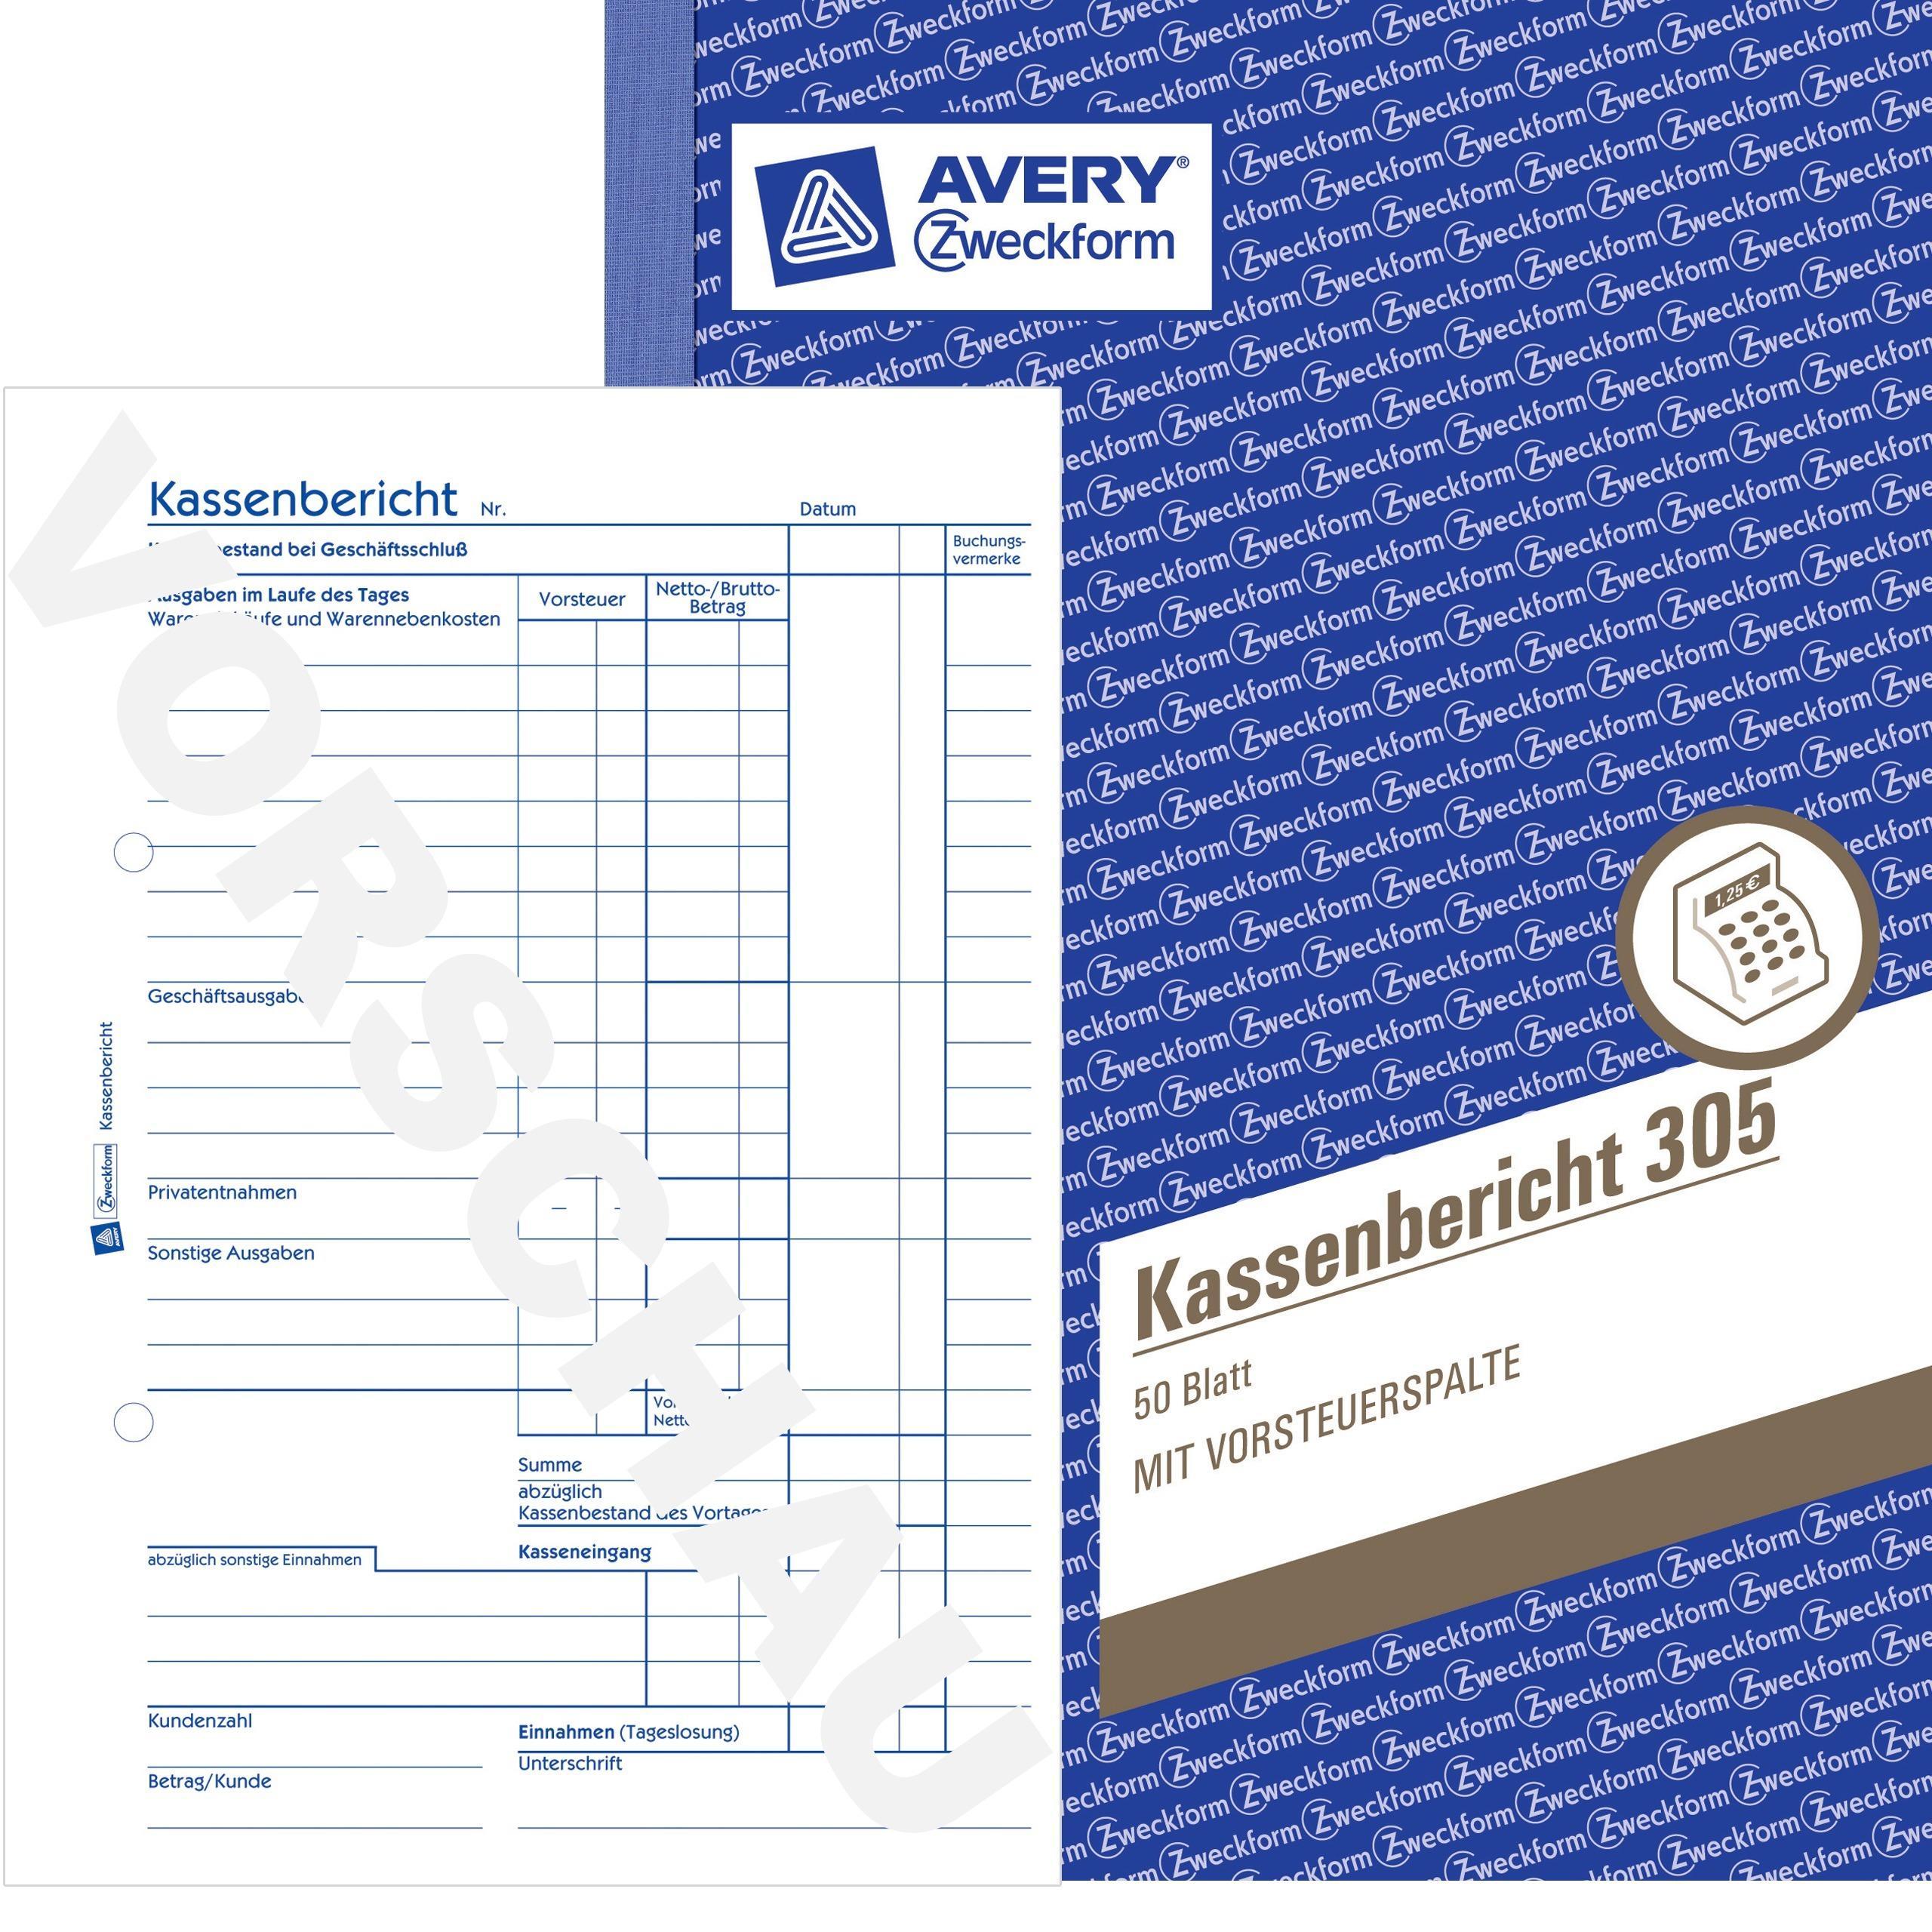 PDF-Download Avery Zweckform 305e Kassenbericht